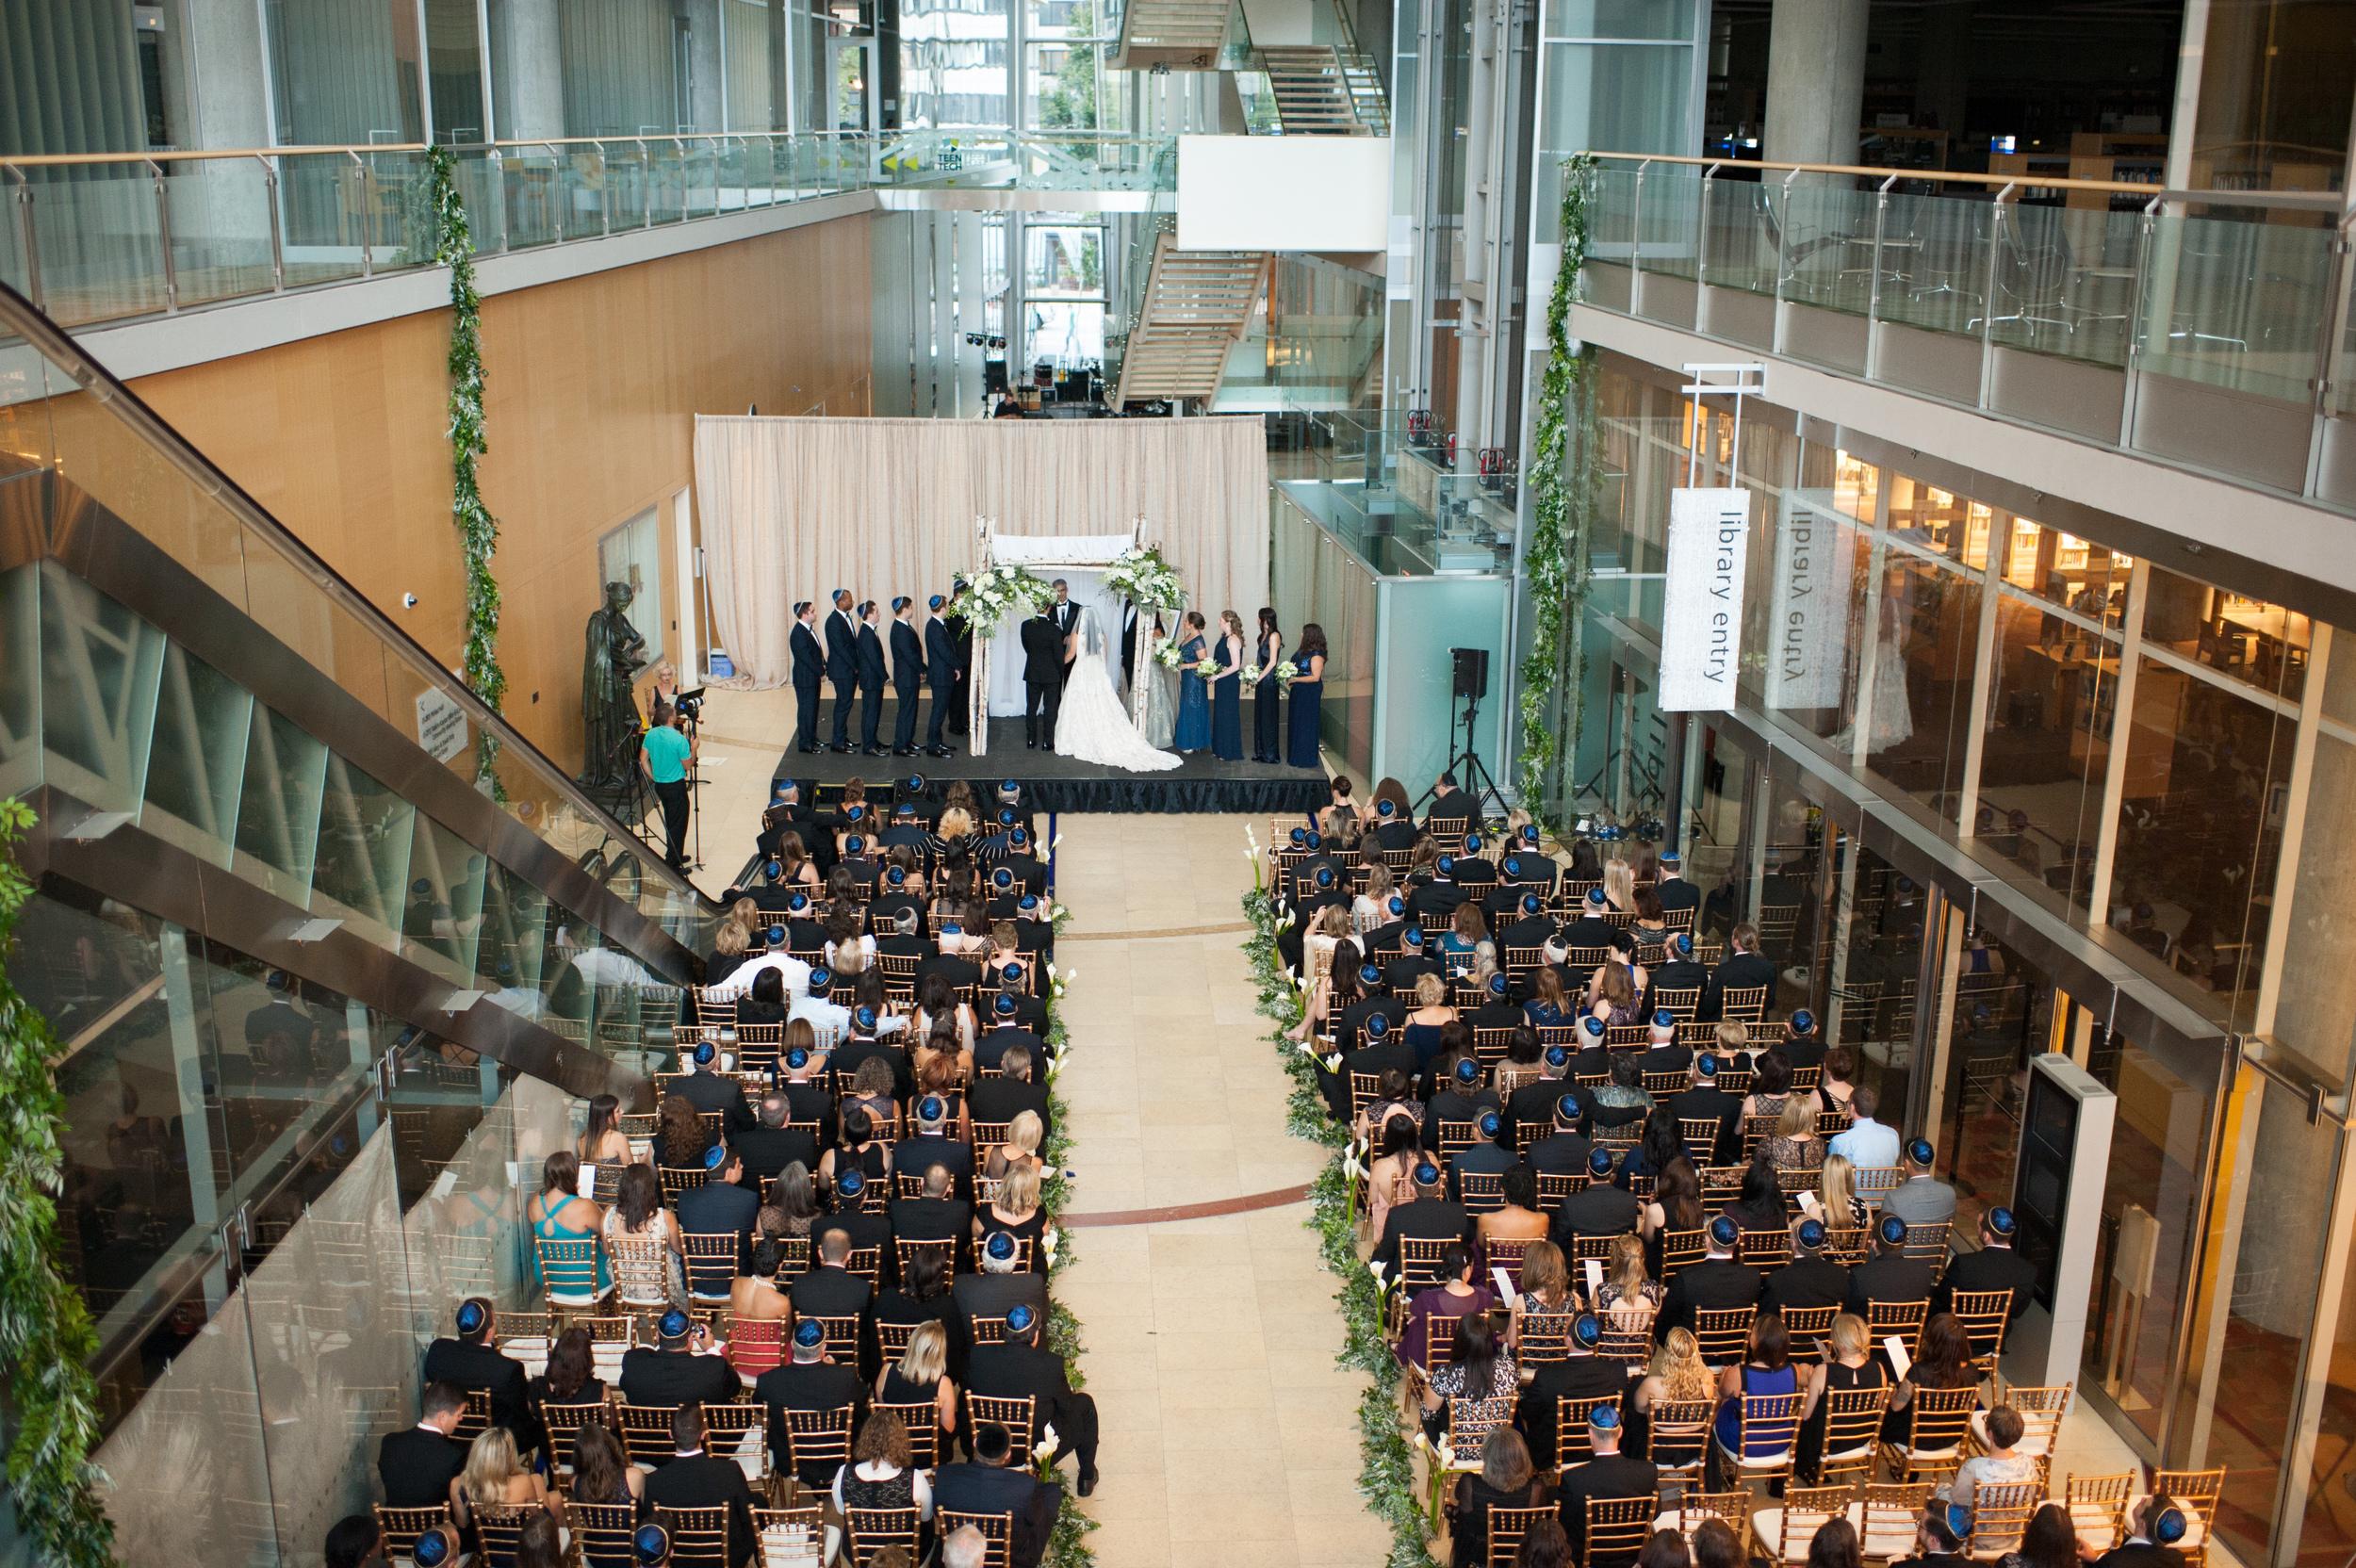 Acowsay_Cinema_MN_Wedding_Ceremony_Venue.jpg